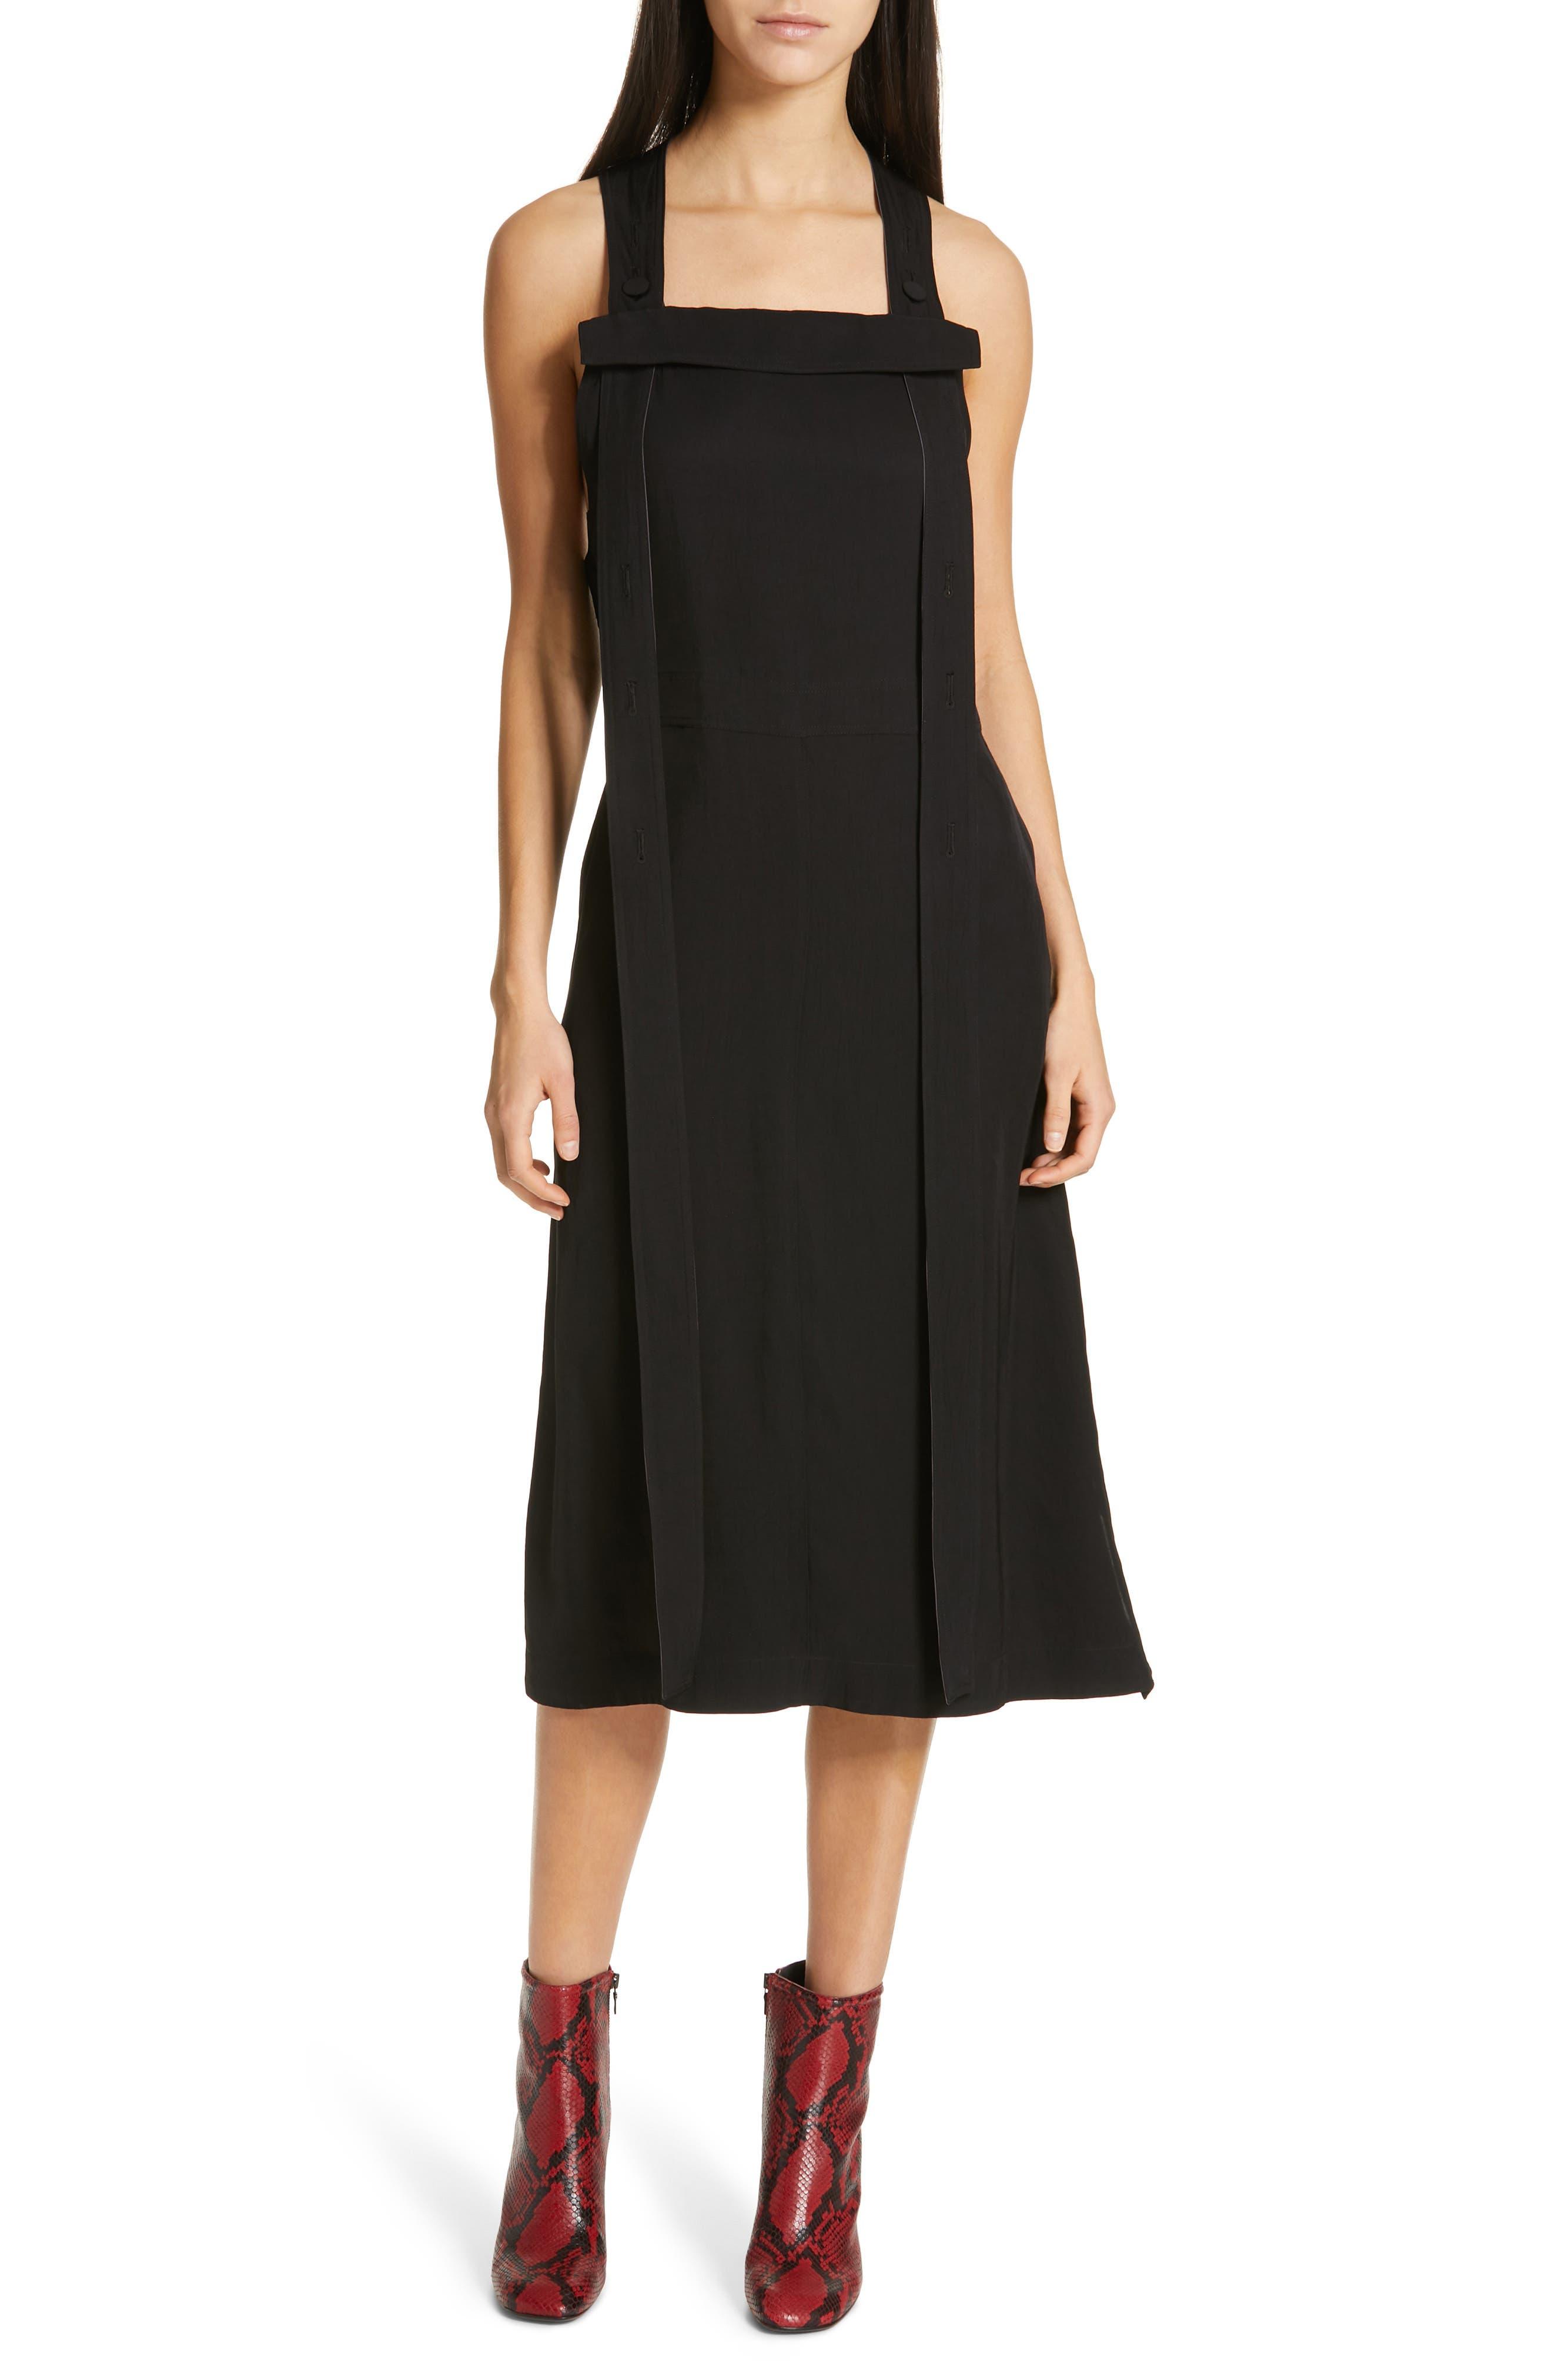 Rag & Bone Adrian Pinafore Dress, Black